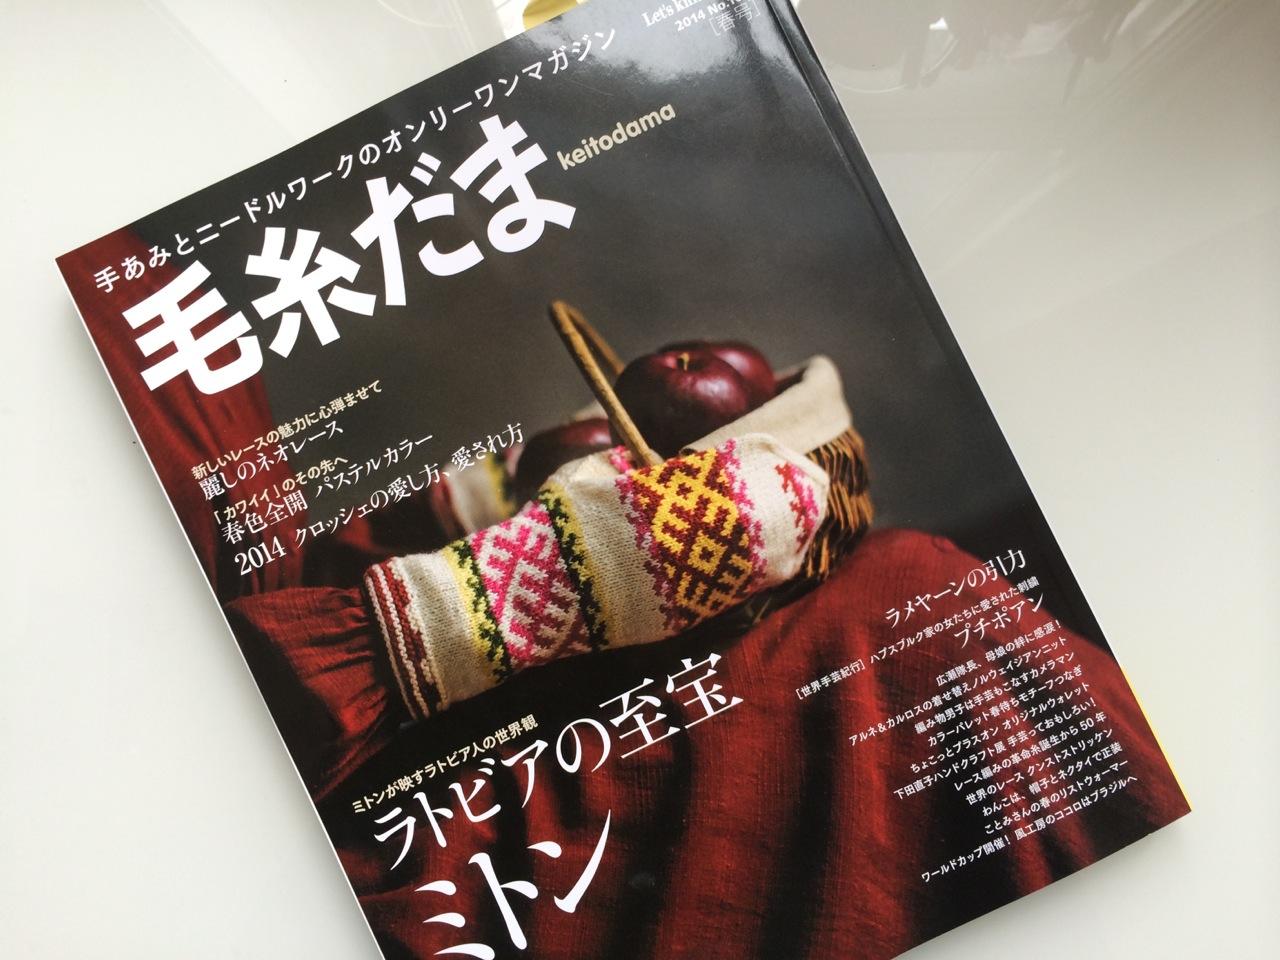 The latest issue of Keitodama.